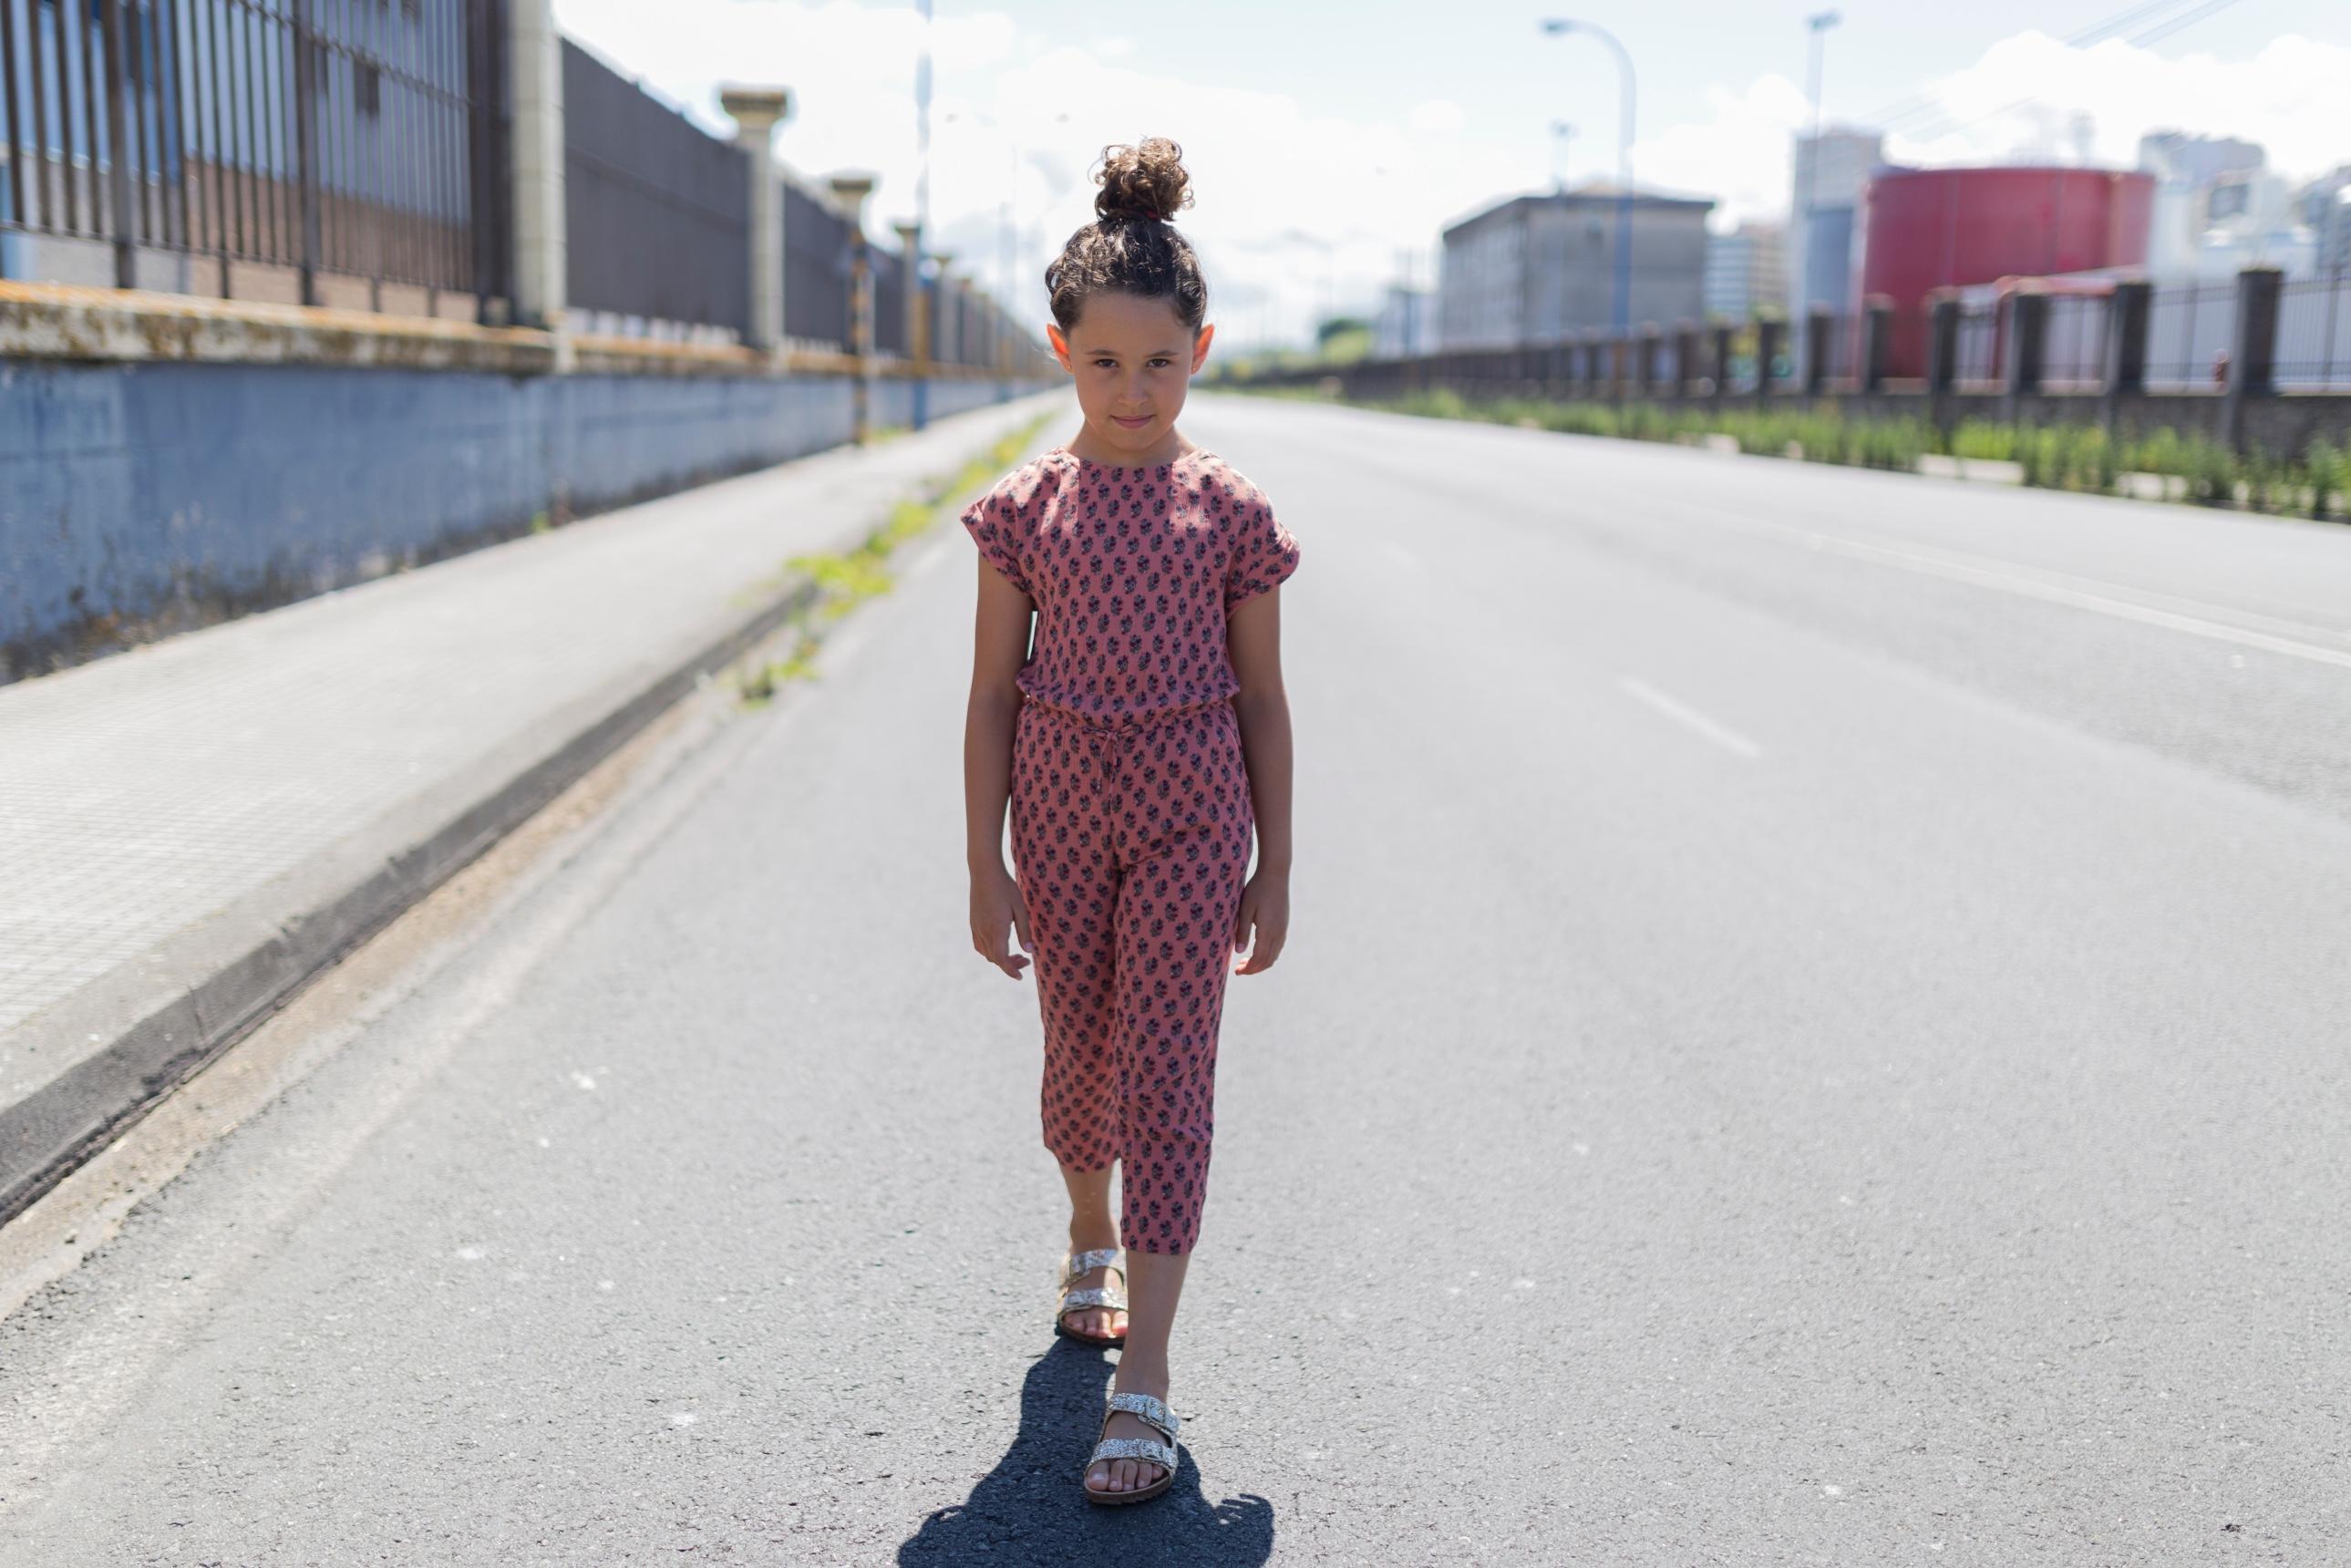 jimena-descalzaporelparque- moda-niños-fashion kids-coruña- jimena look- kids- miniblogger- ministyle- Soft- streetstyle- zara- zara kids- zara soft